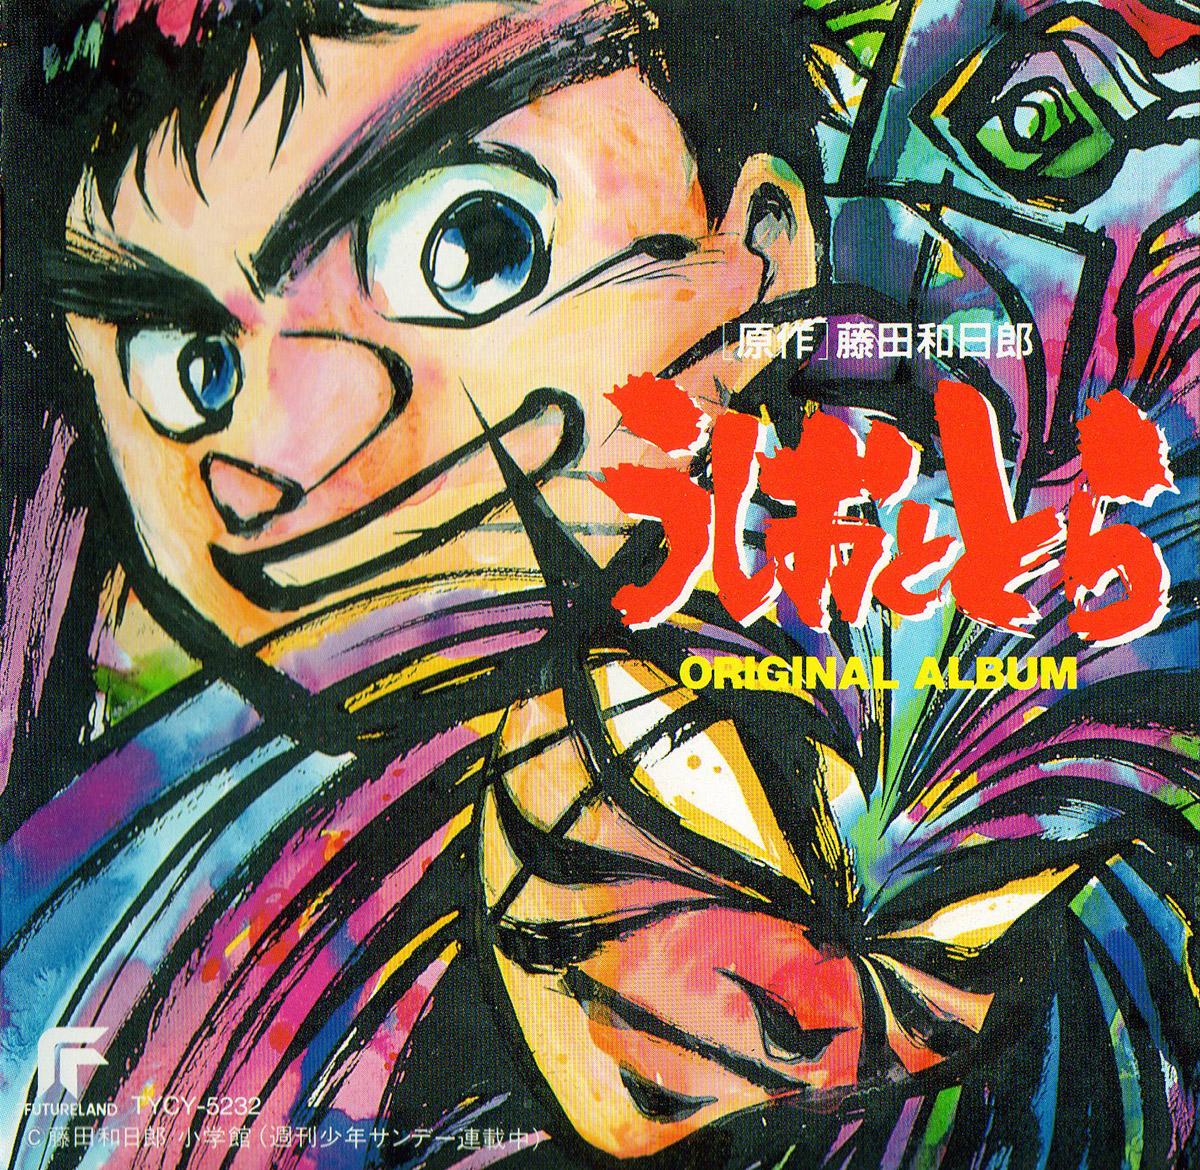 Ushio And Tora Bs: Ushio To Tora Original Album музыка из игры